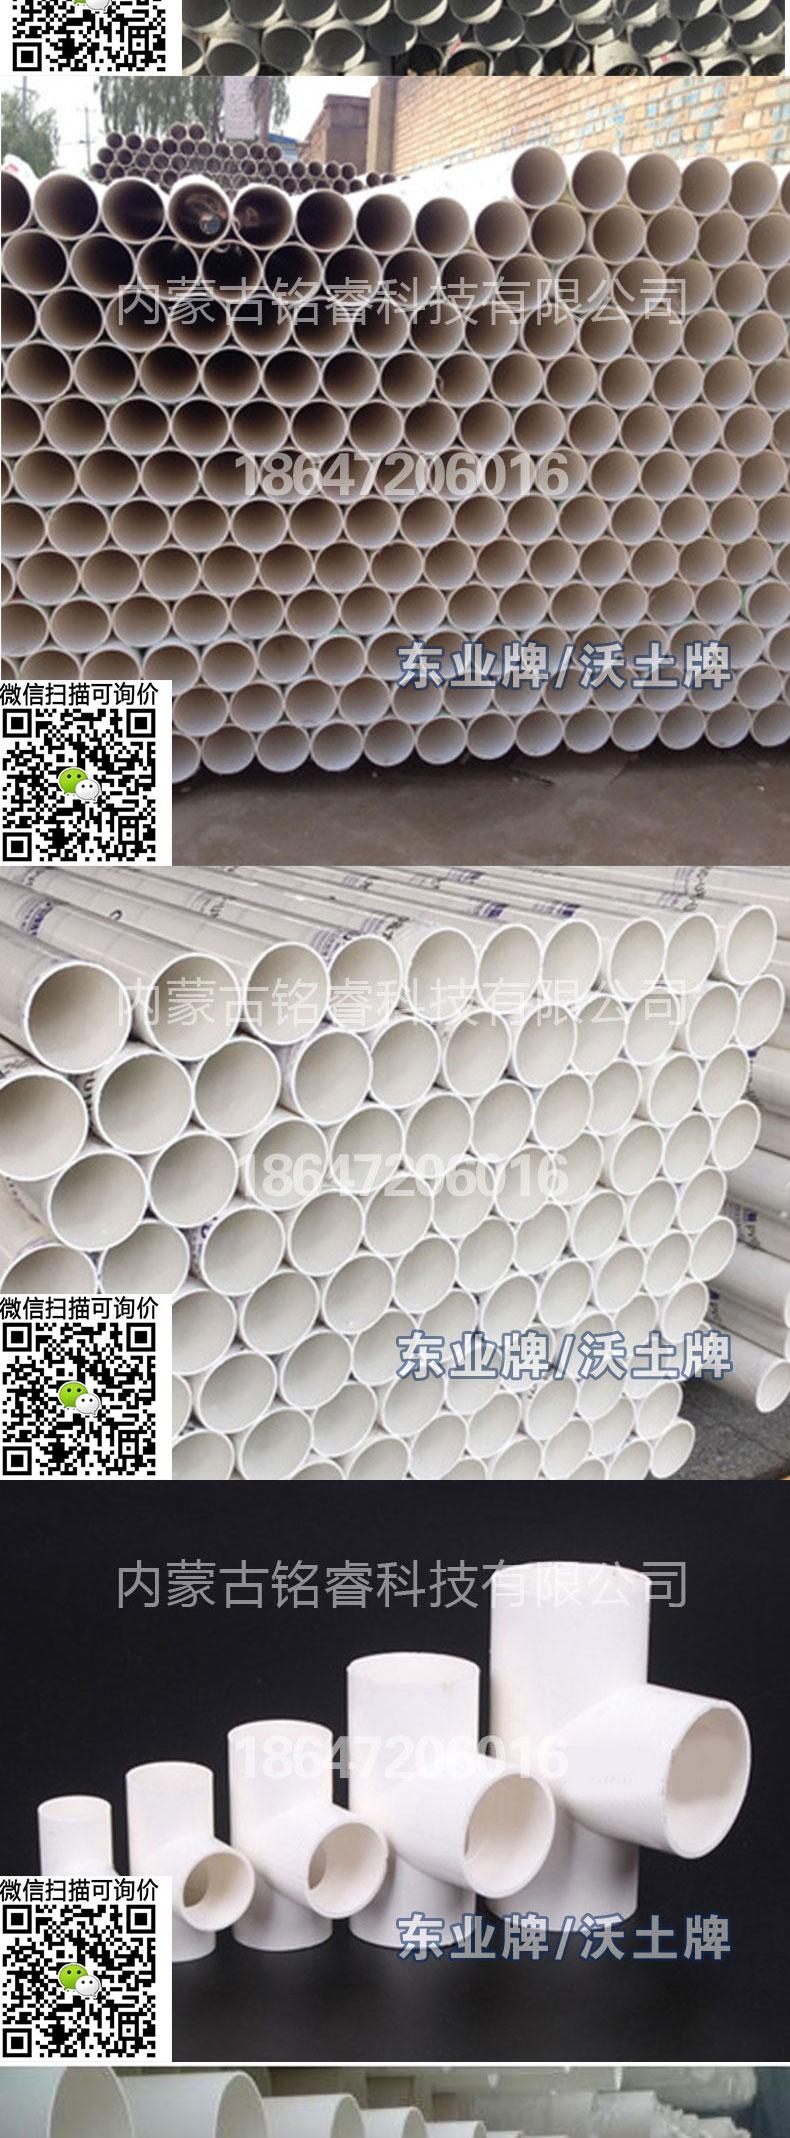 PVC-U排水管详情页_05.jpg